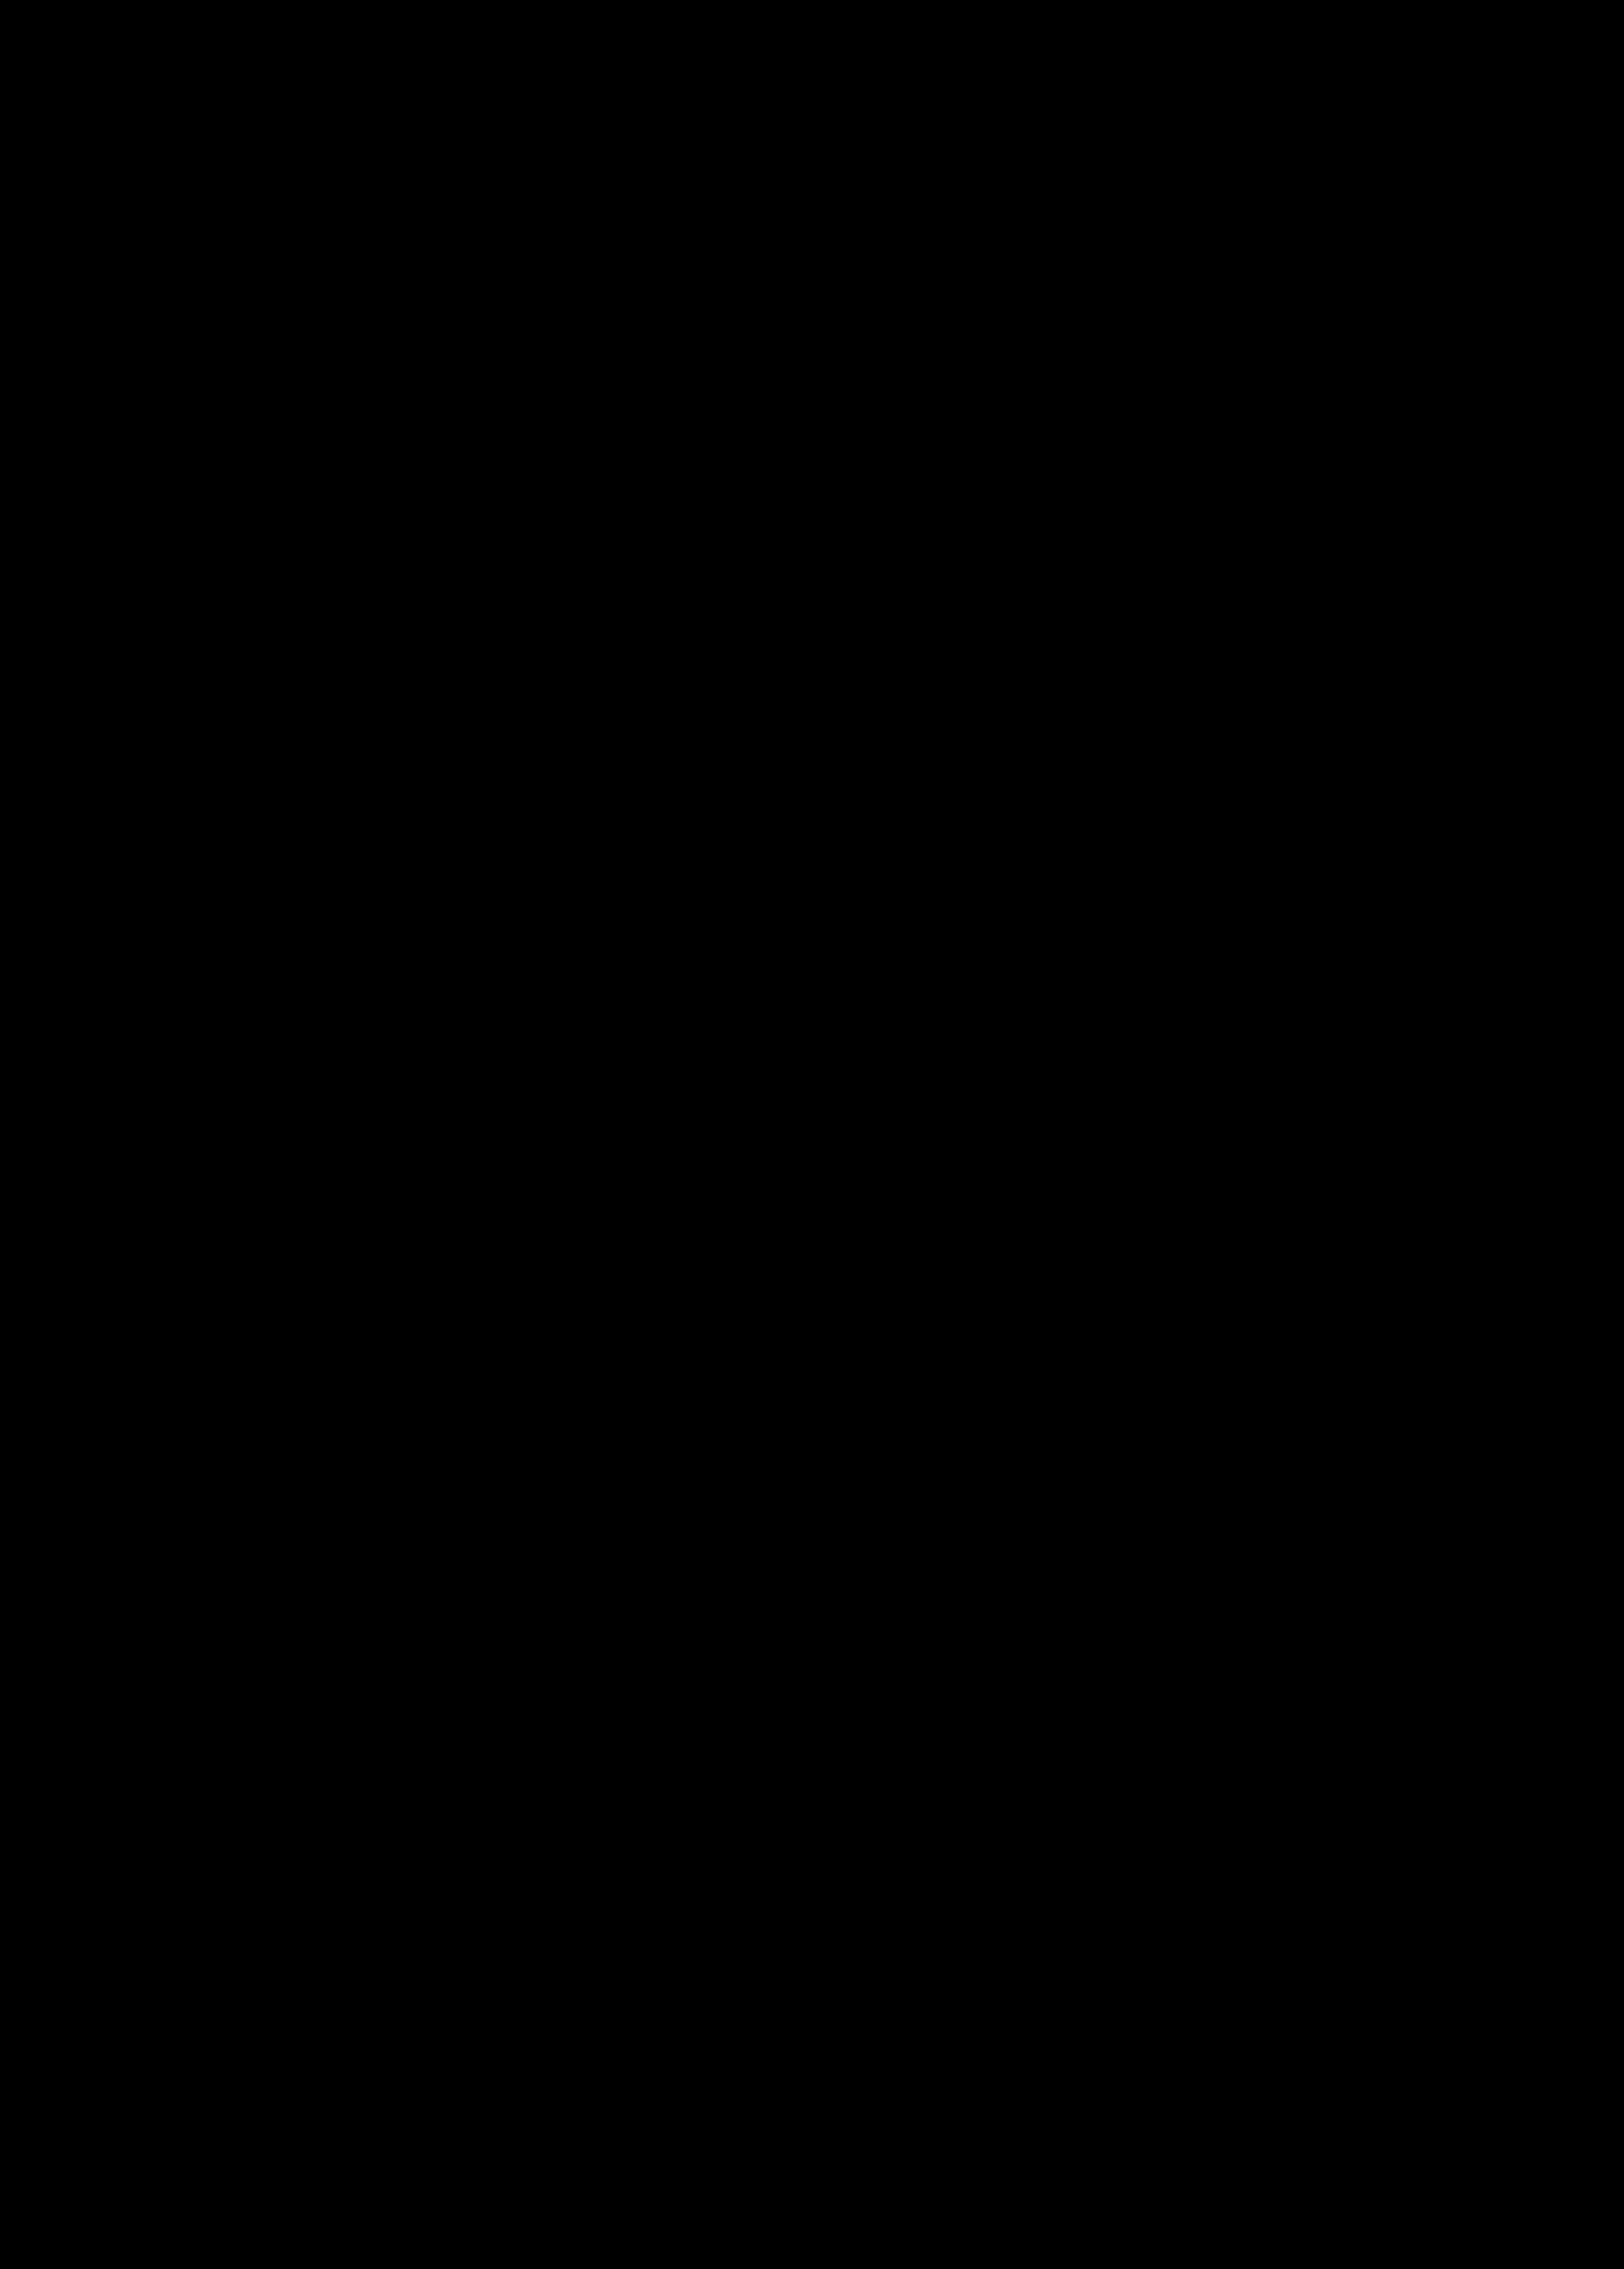 File Foxprint Wikimedia Commons Open Ⓒ.